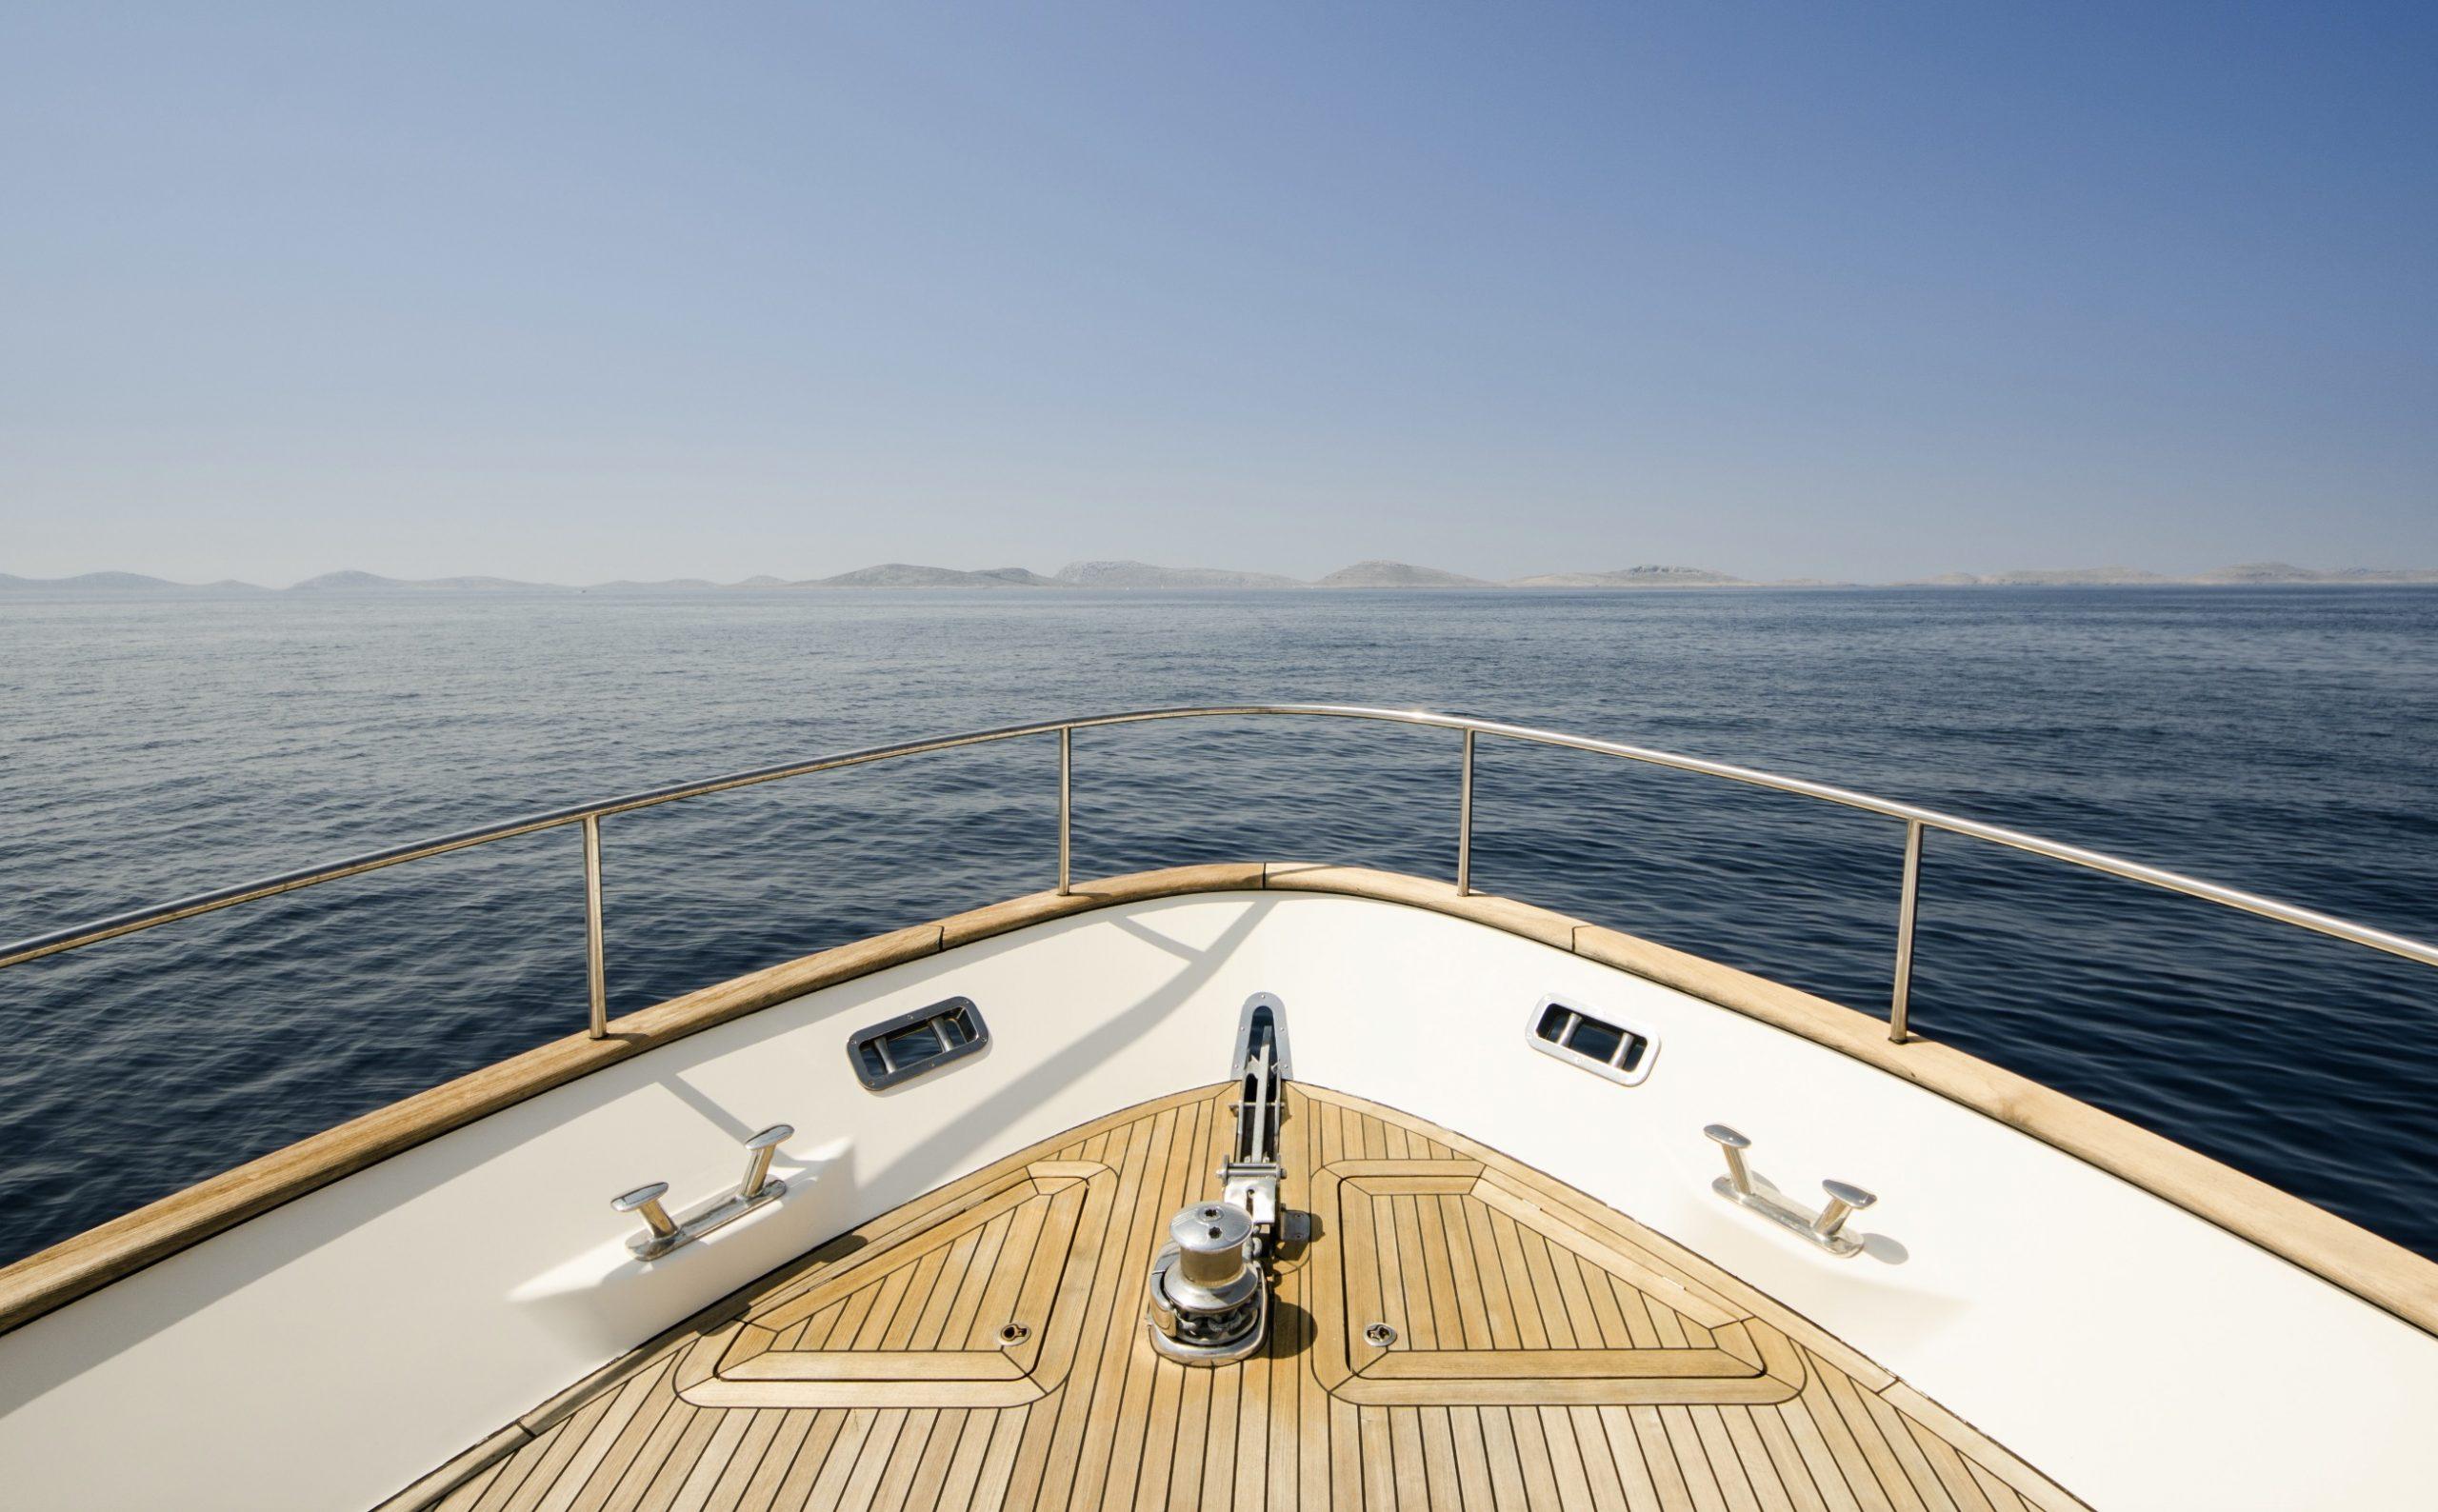 yacht interior design, luxury living, yacht life, luxury yachts, luxury interior design and architecture, uk interior designers